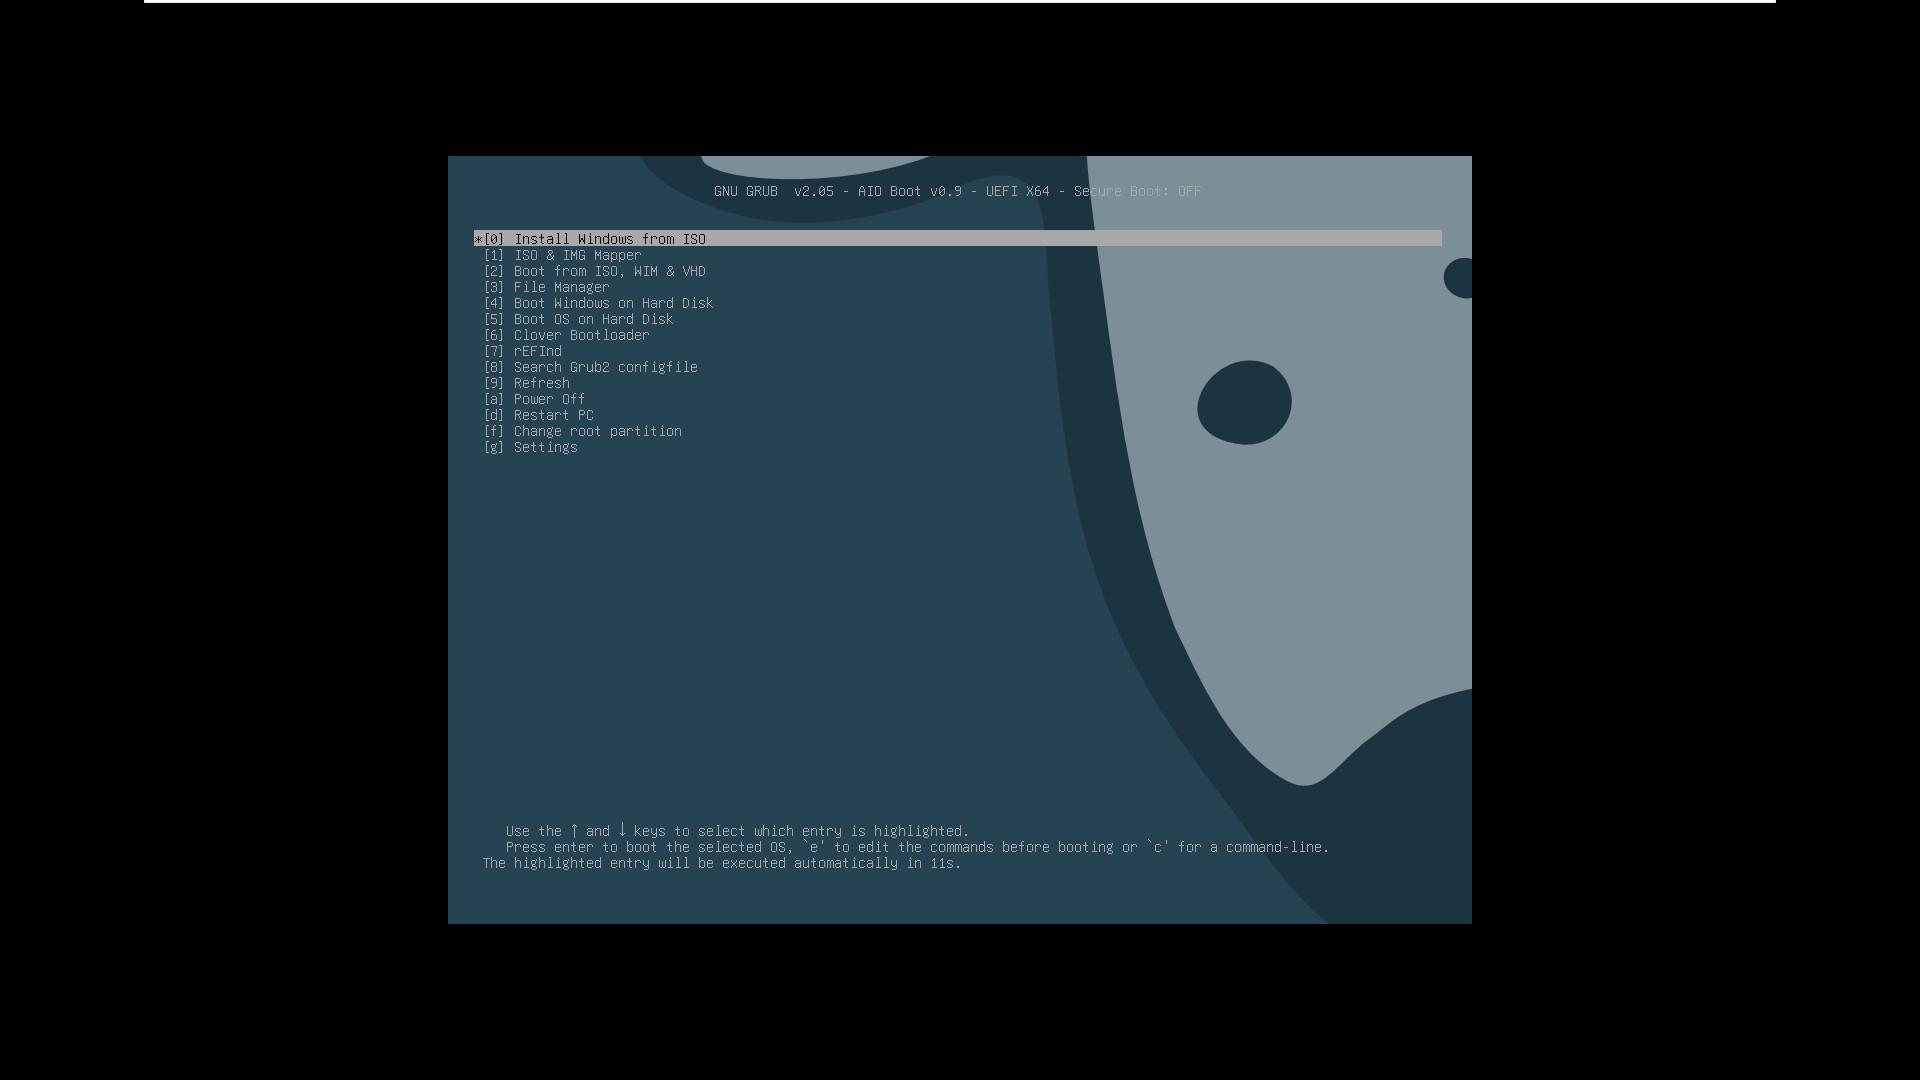 Ventoy 제가 올린 외부 설정 파일 - AIO Boot로 전환 잘 됩니다. UEFI 모드 2020-09-26_180139.jpg